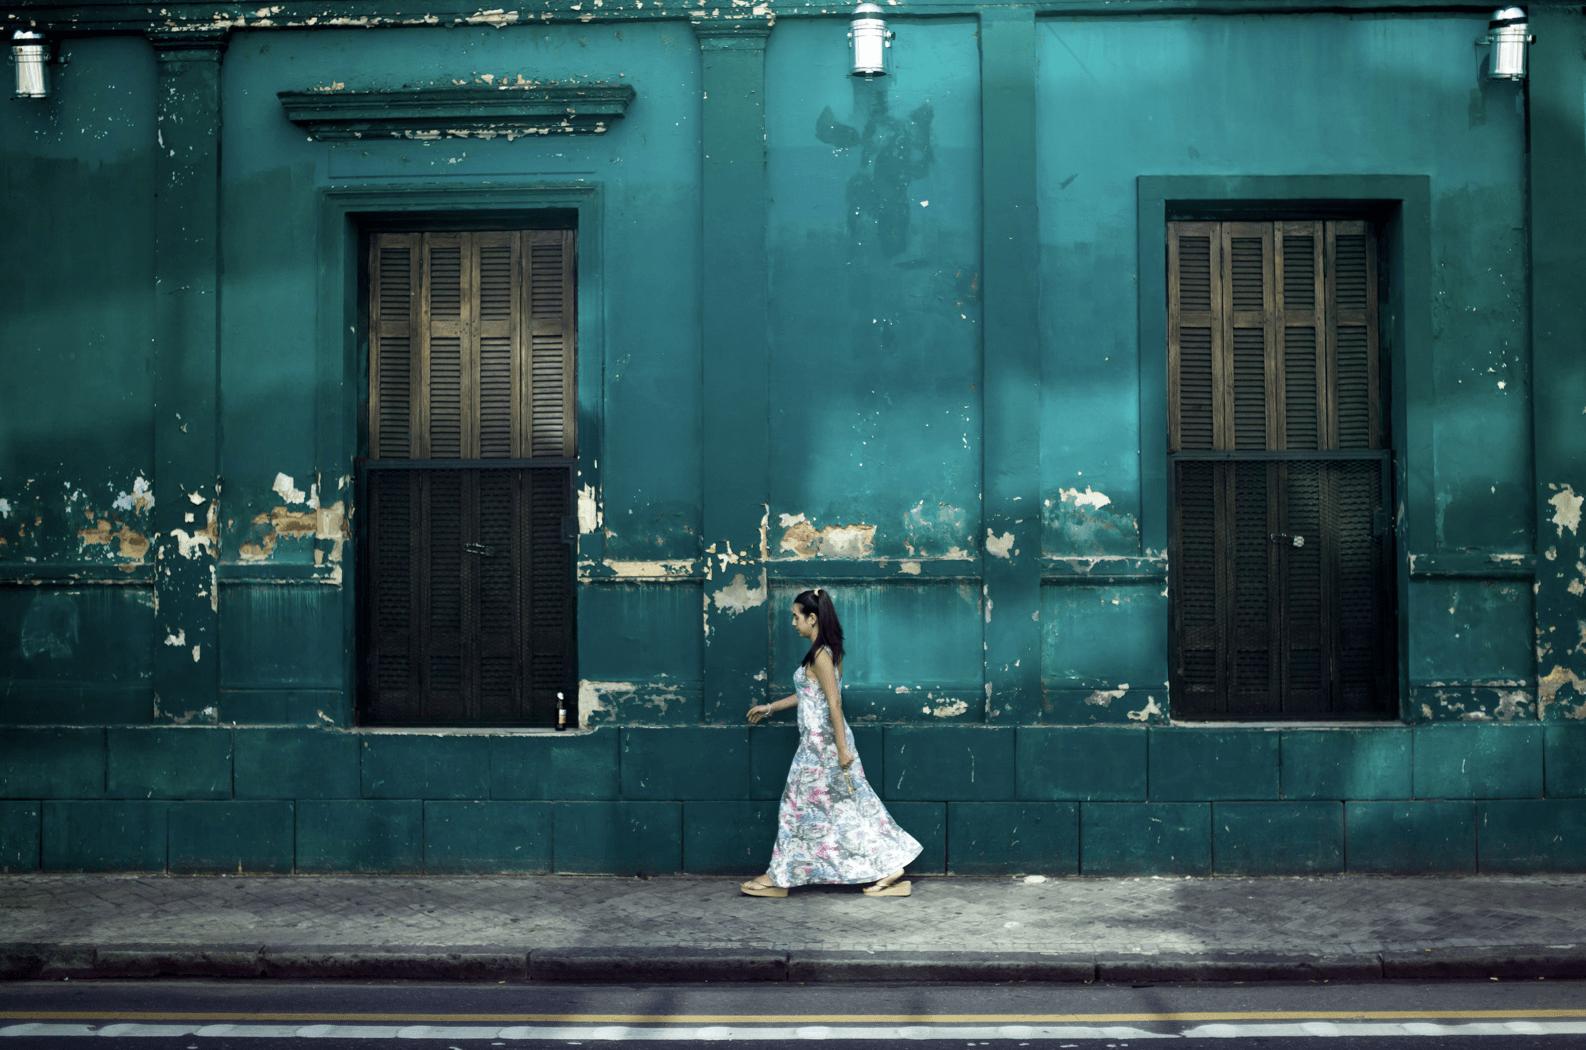 Yanidel   10 Amazing Street Photographers You Should Know